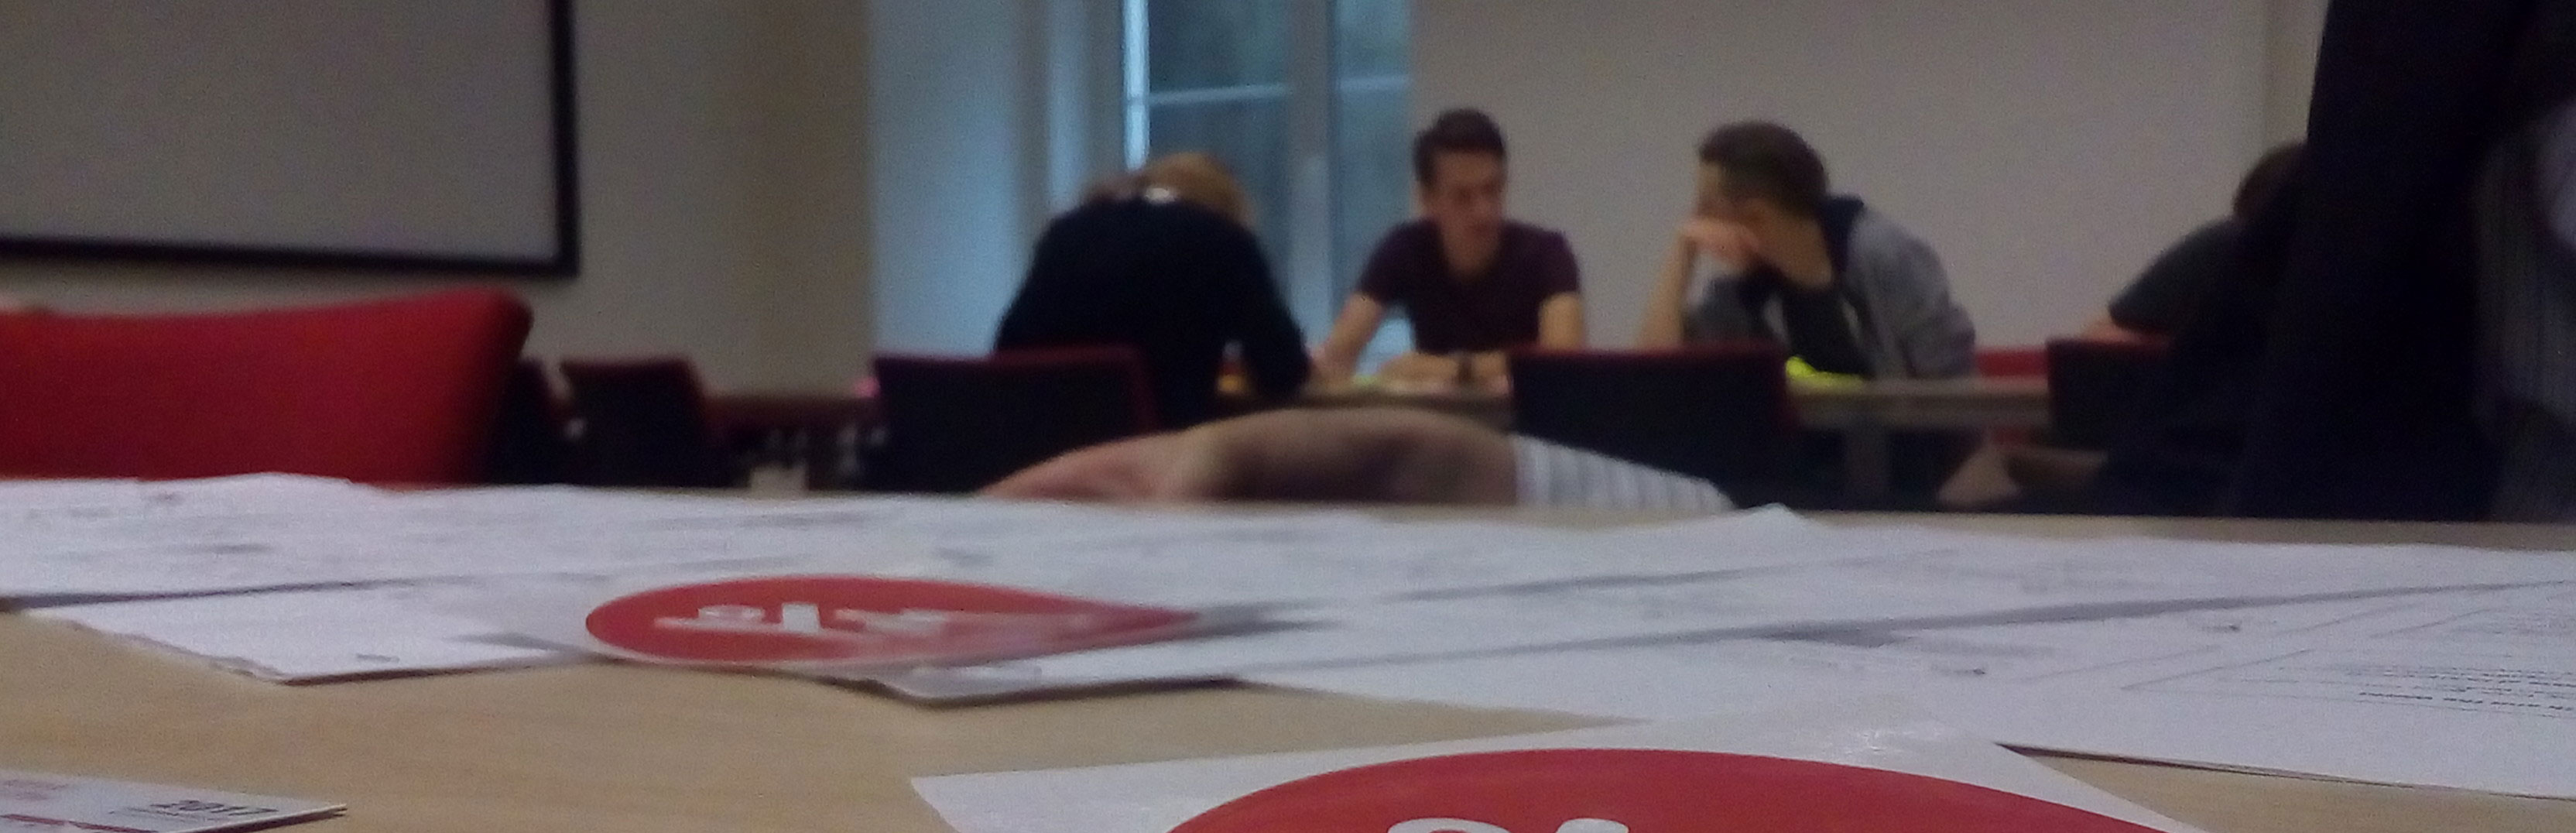 Brno Study Group meeting